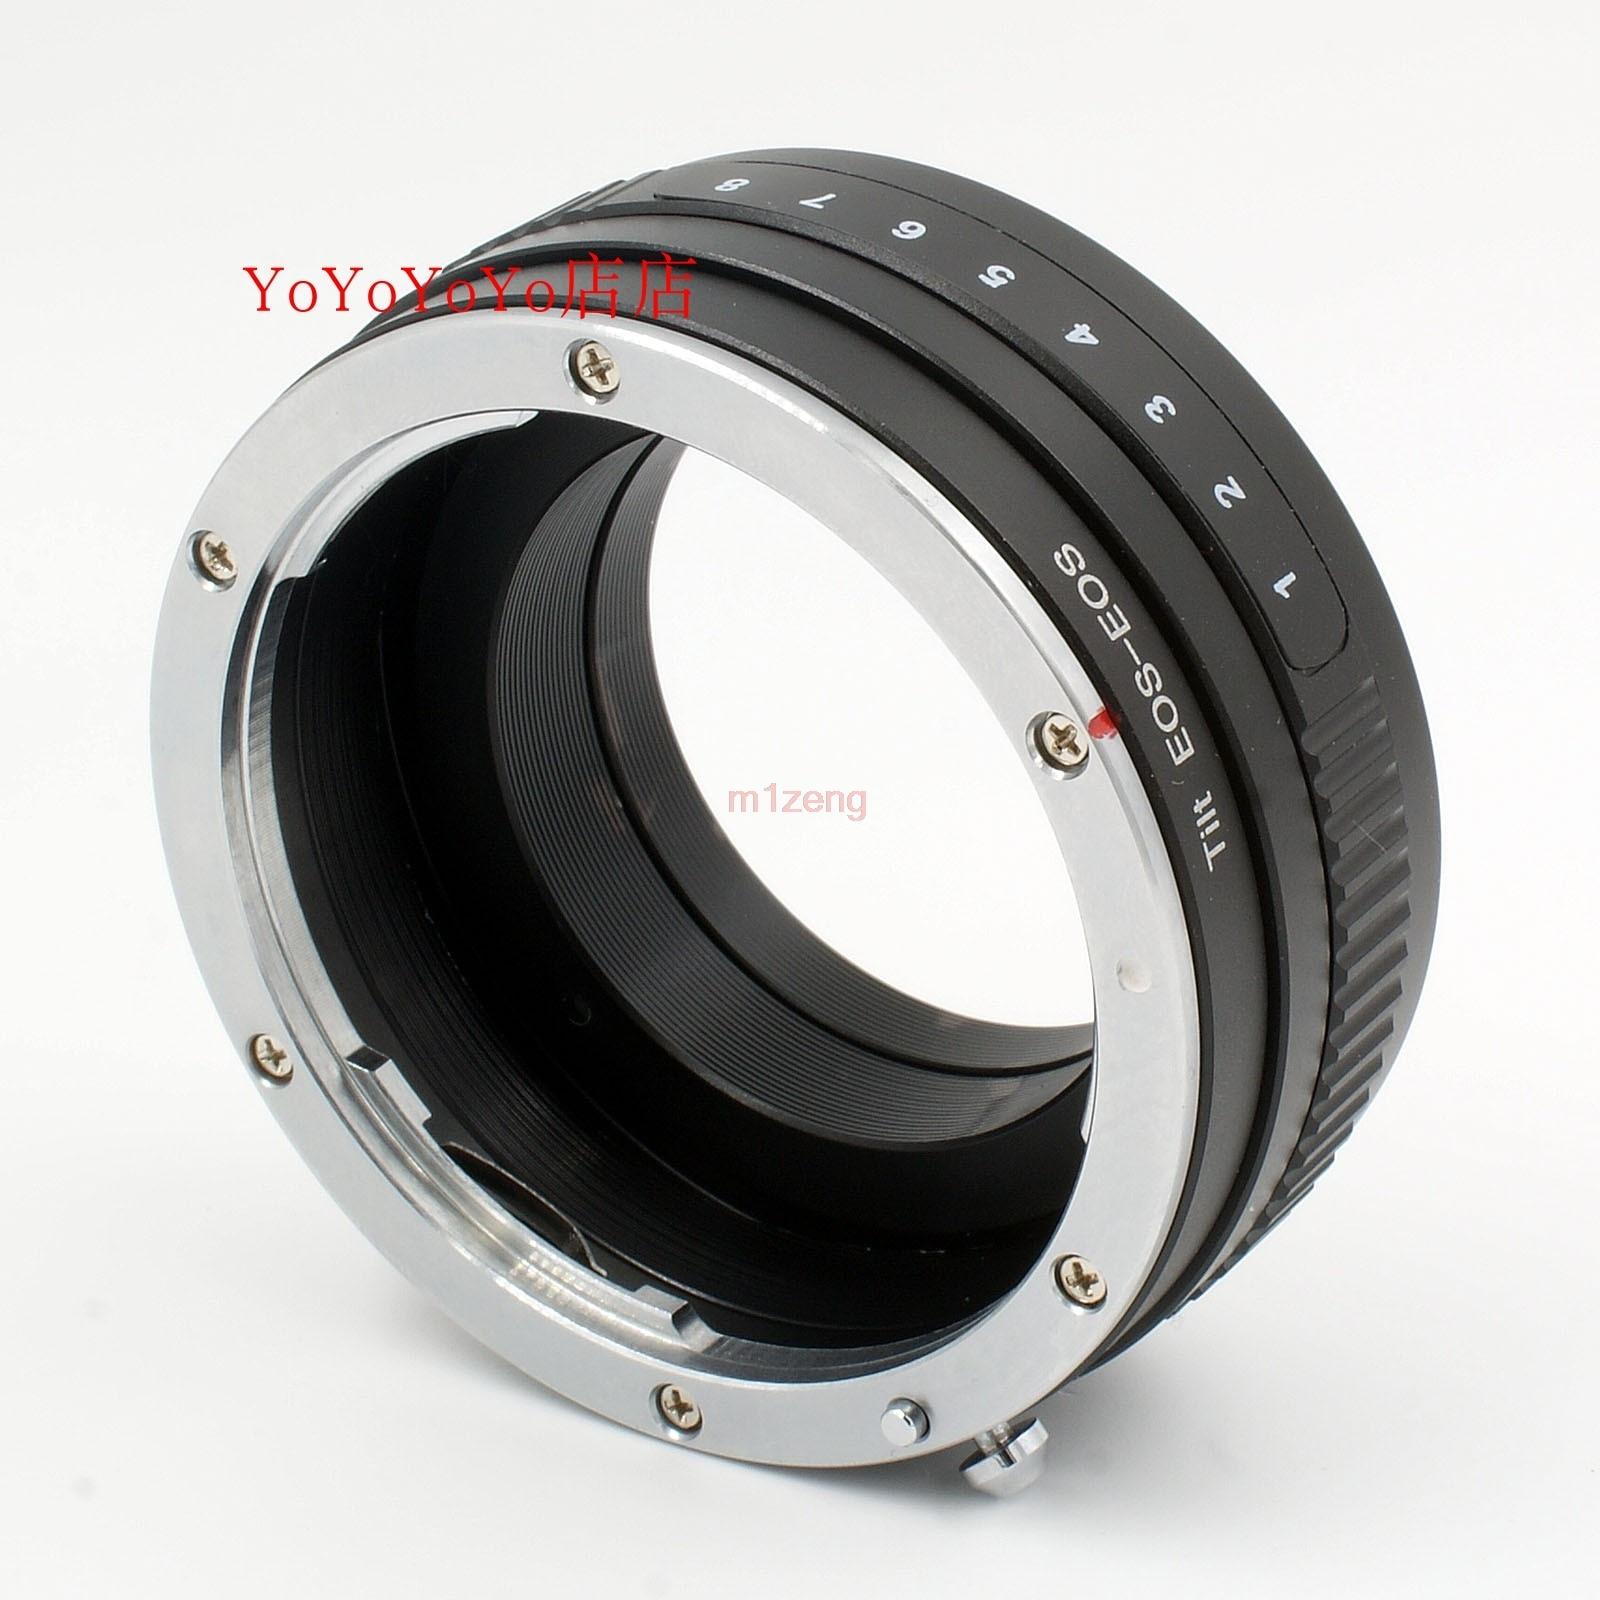 Macro d'inclinaison bague d'adaptation d'objectif pour canon ef lentille à 5d3 5d4 6d 7d 7dii 60d 70d 550d 600d 650d 760d 1100d caméra